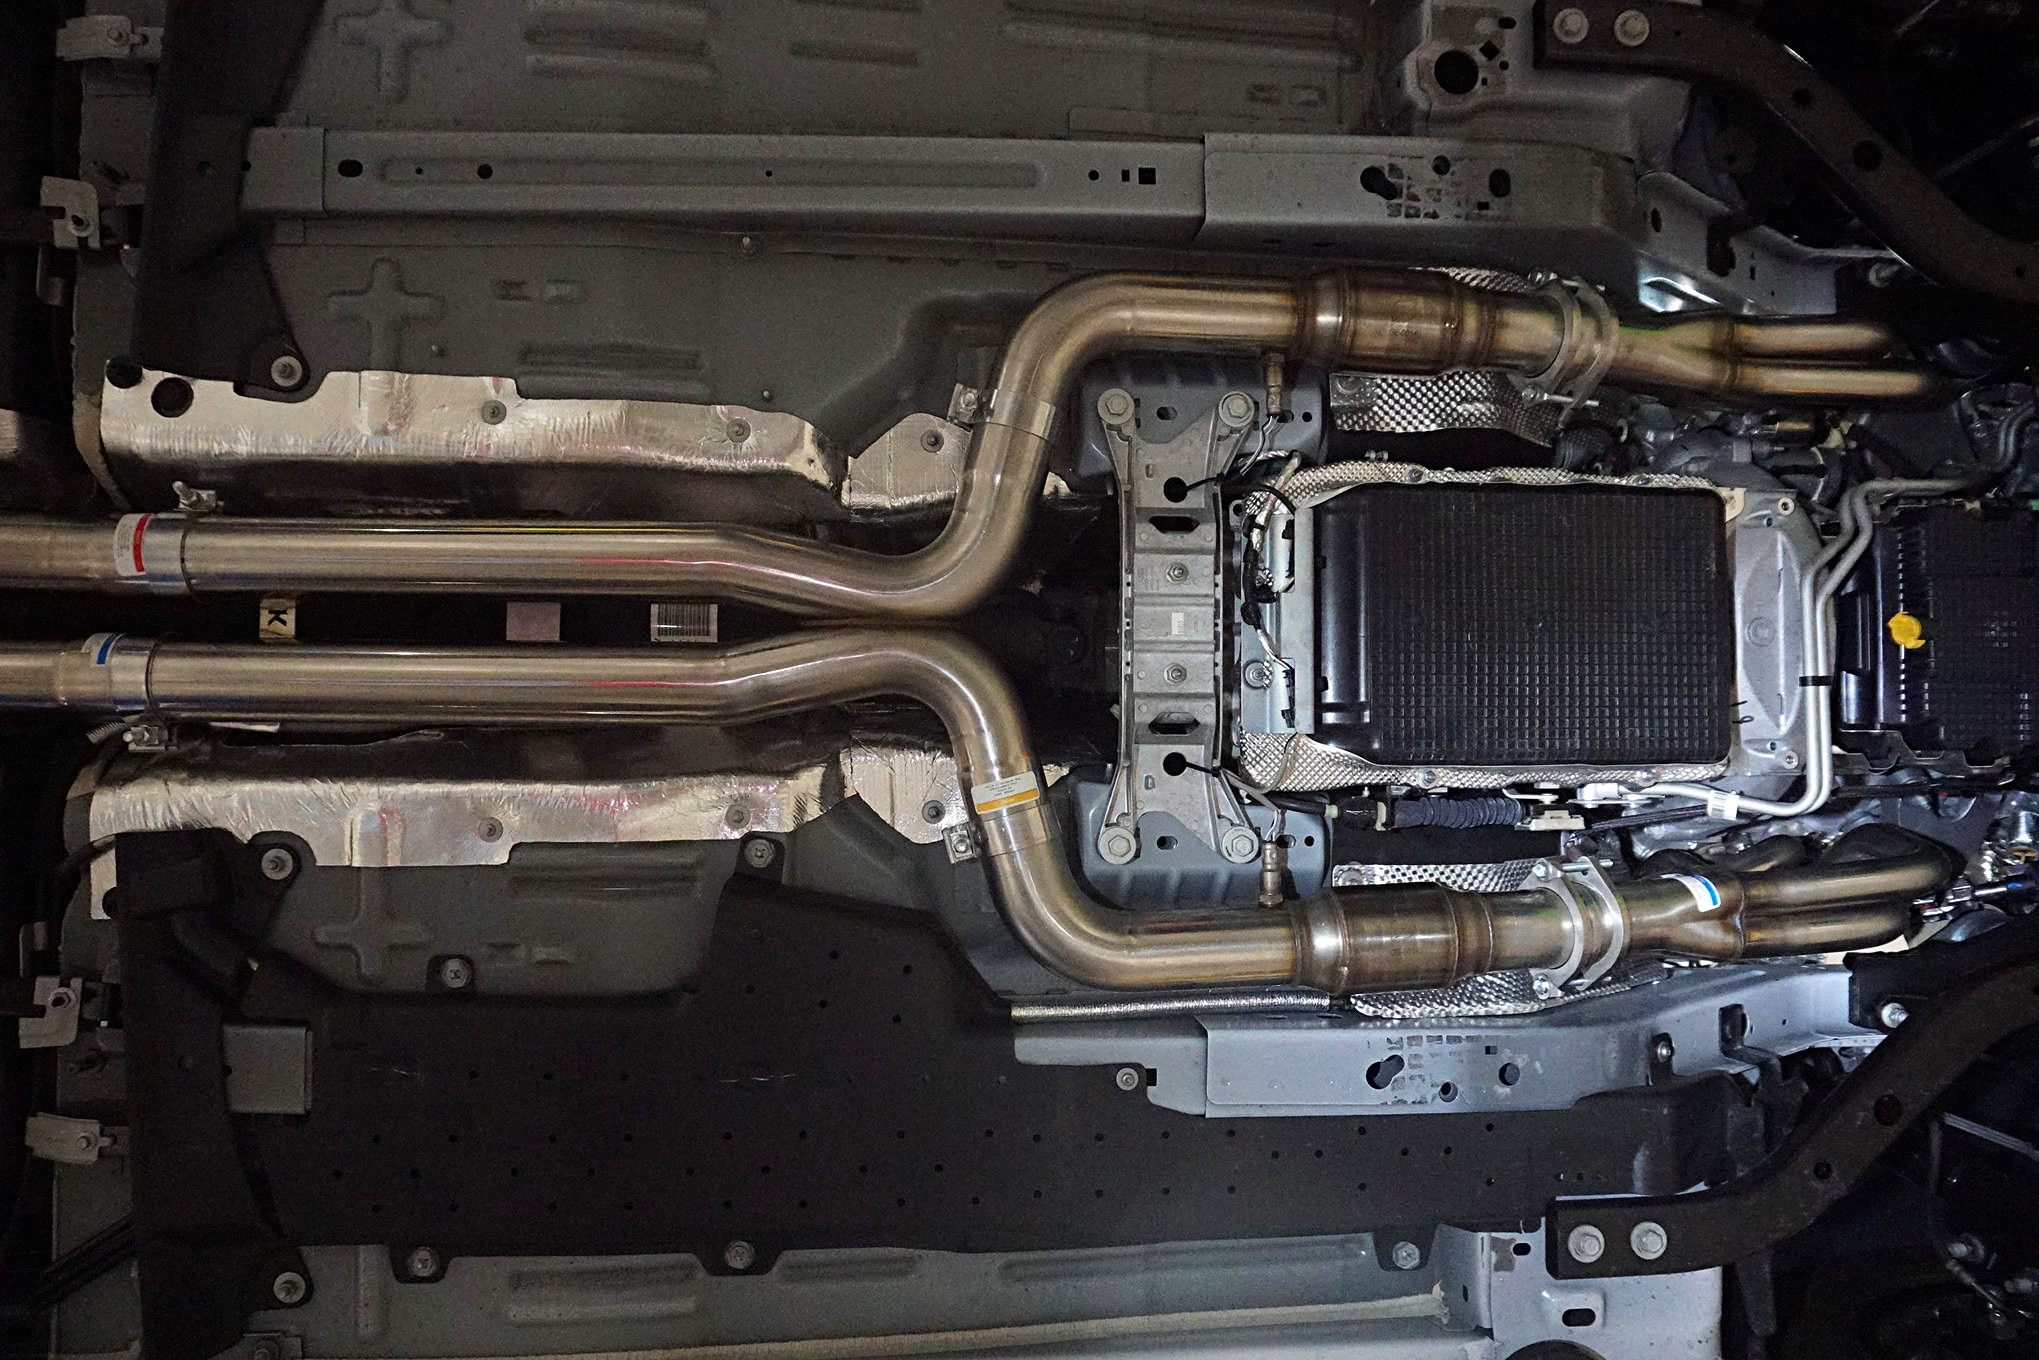 045 Mustang Kooks Exhaust